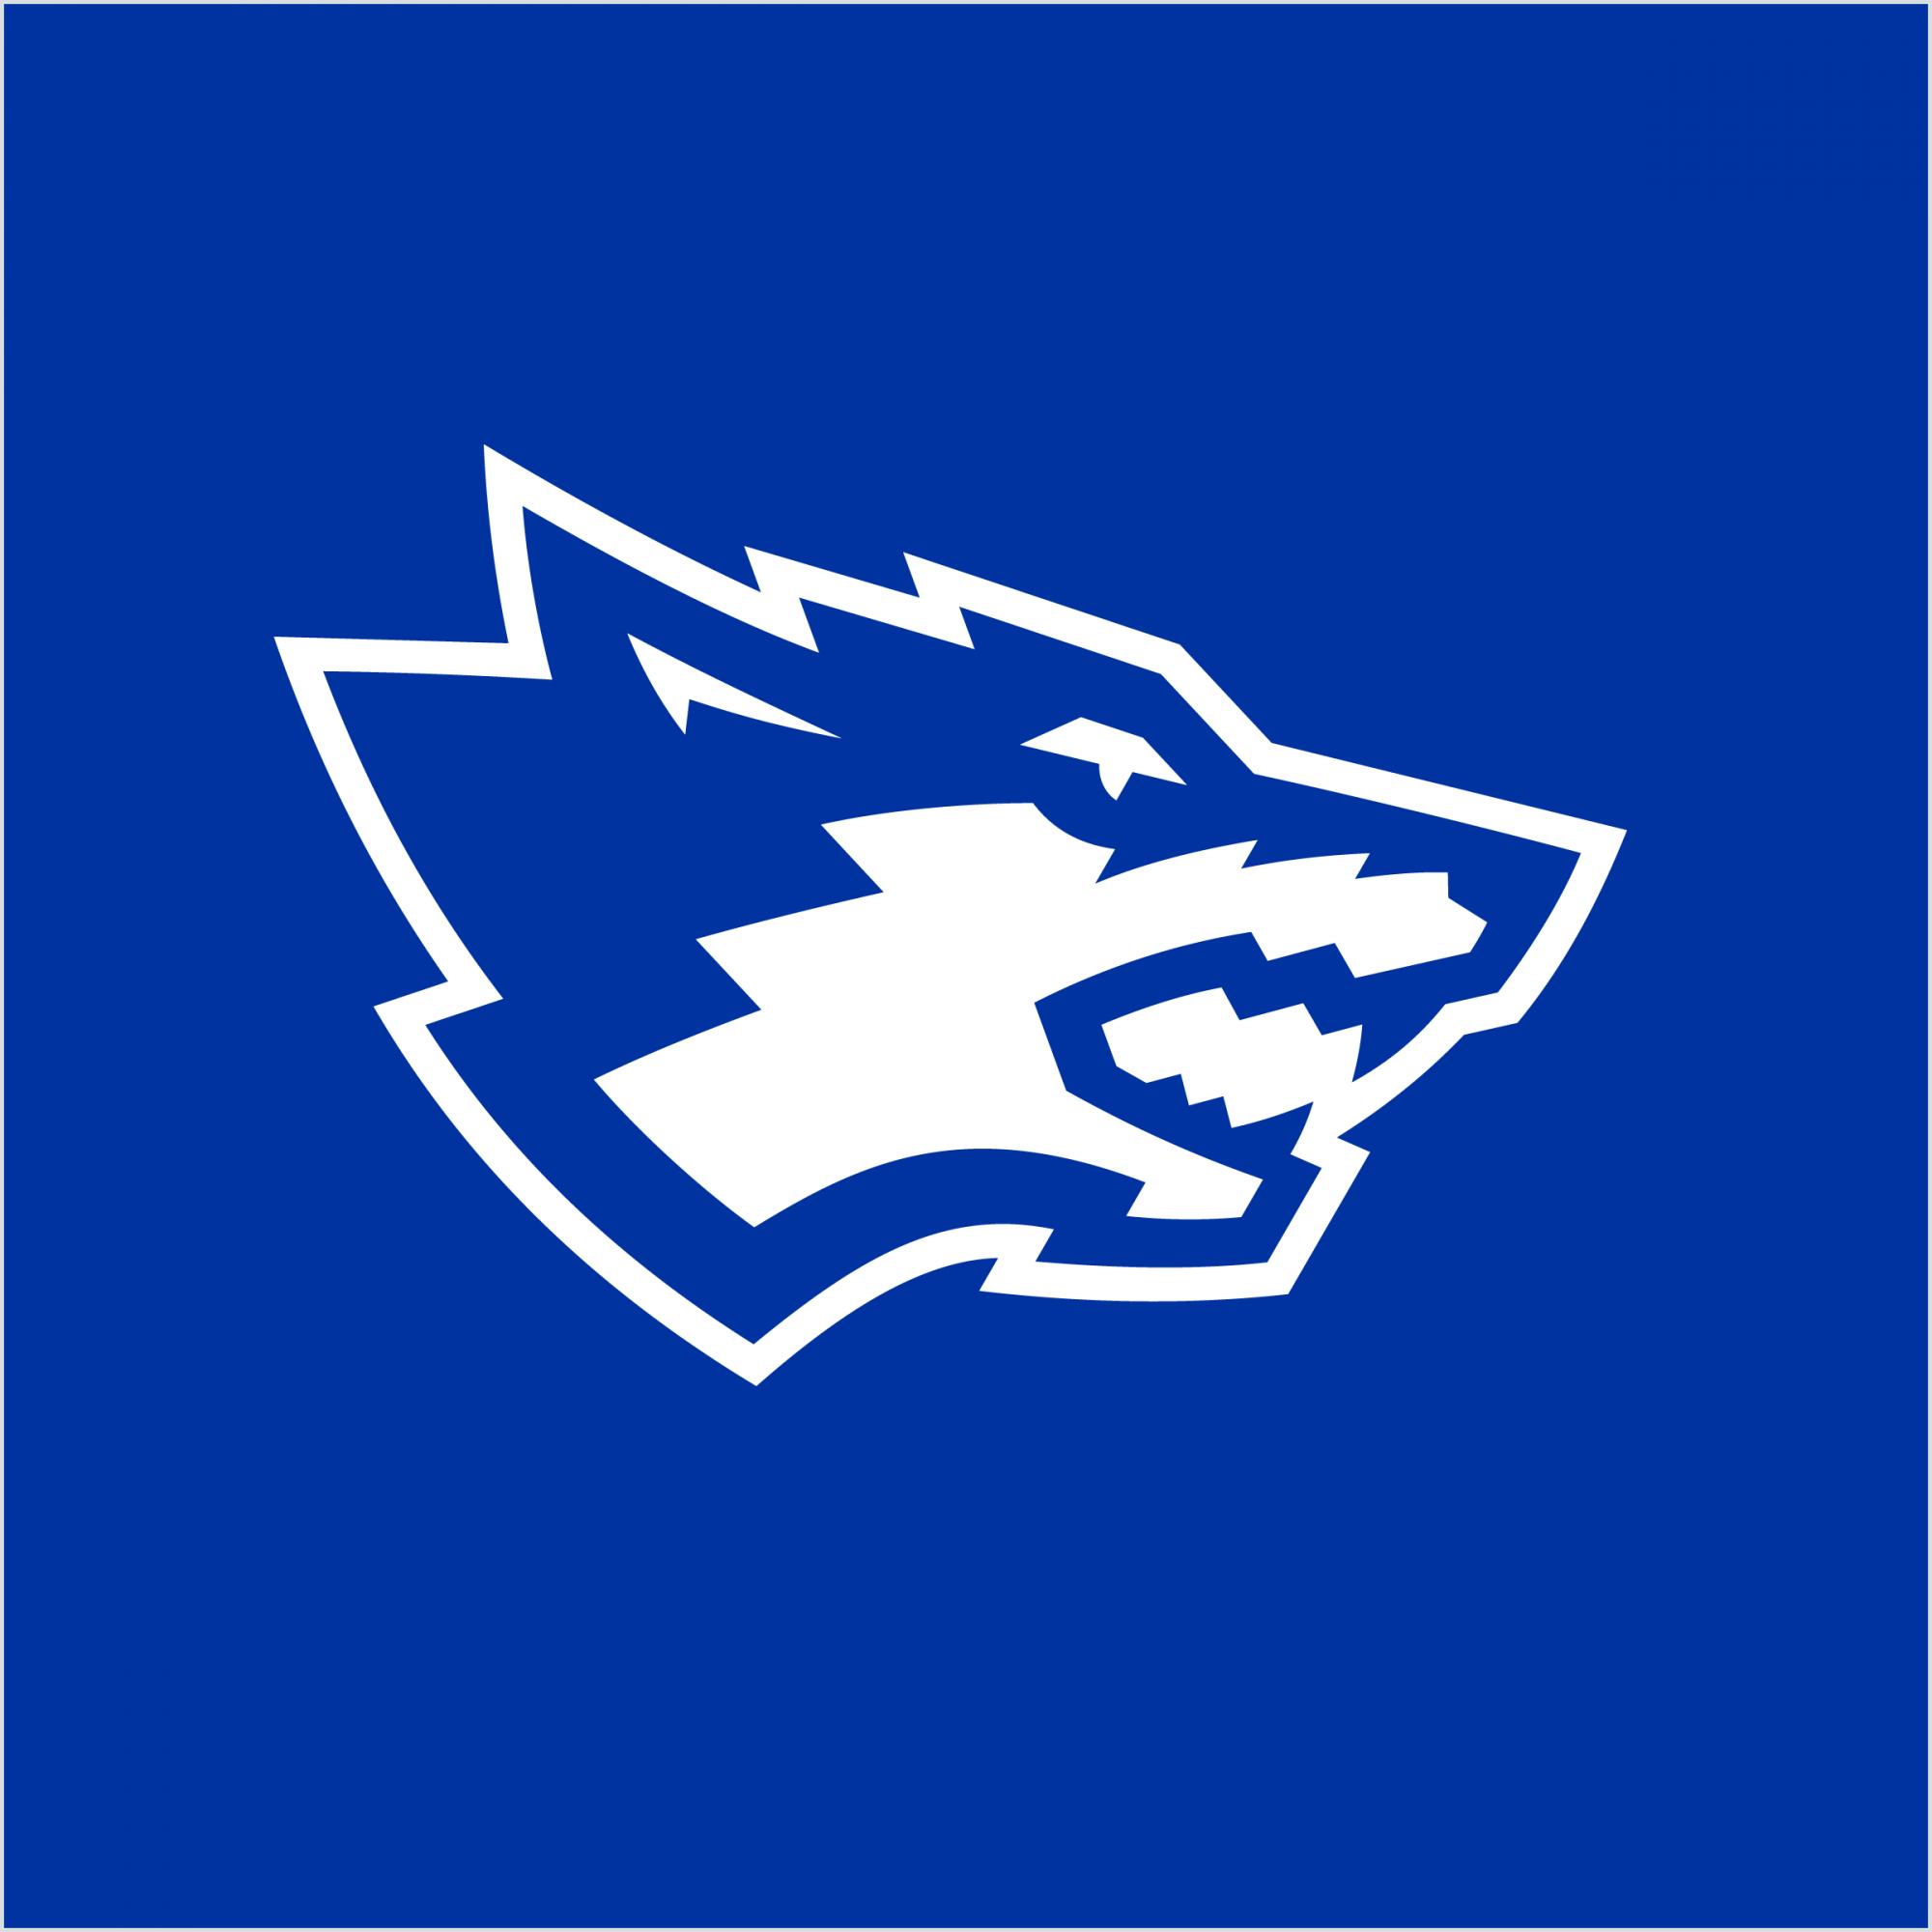 динамо москва хоккейный клуб логотип